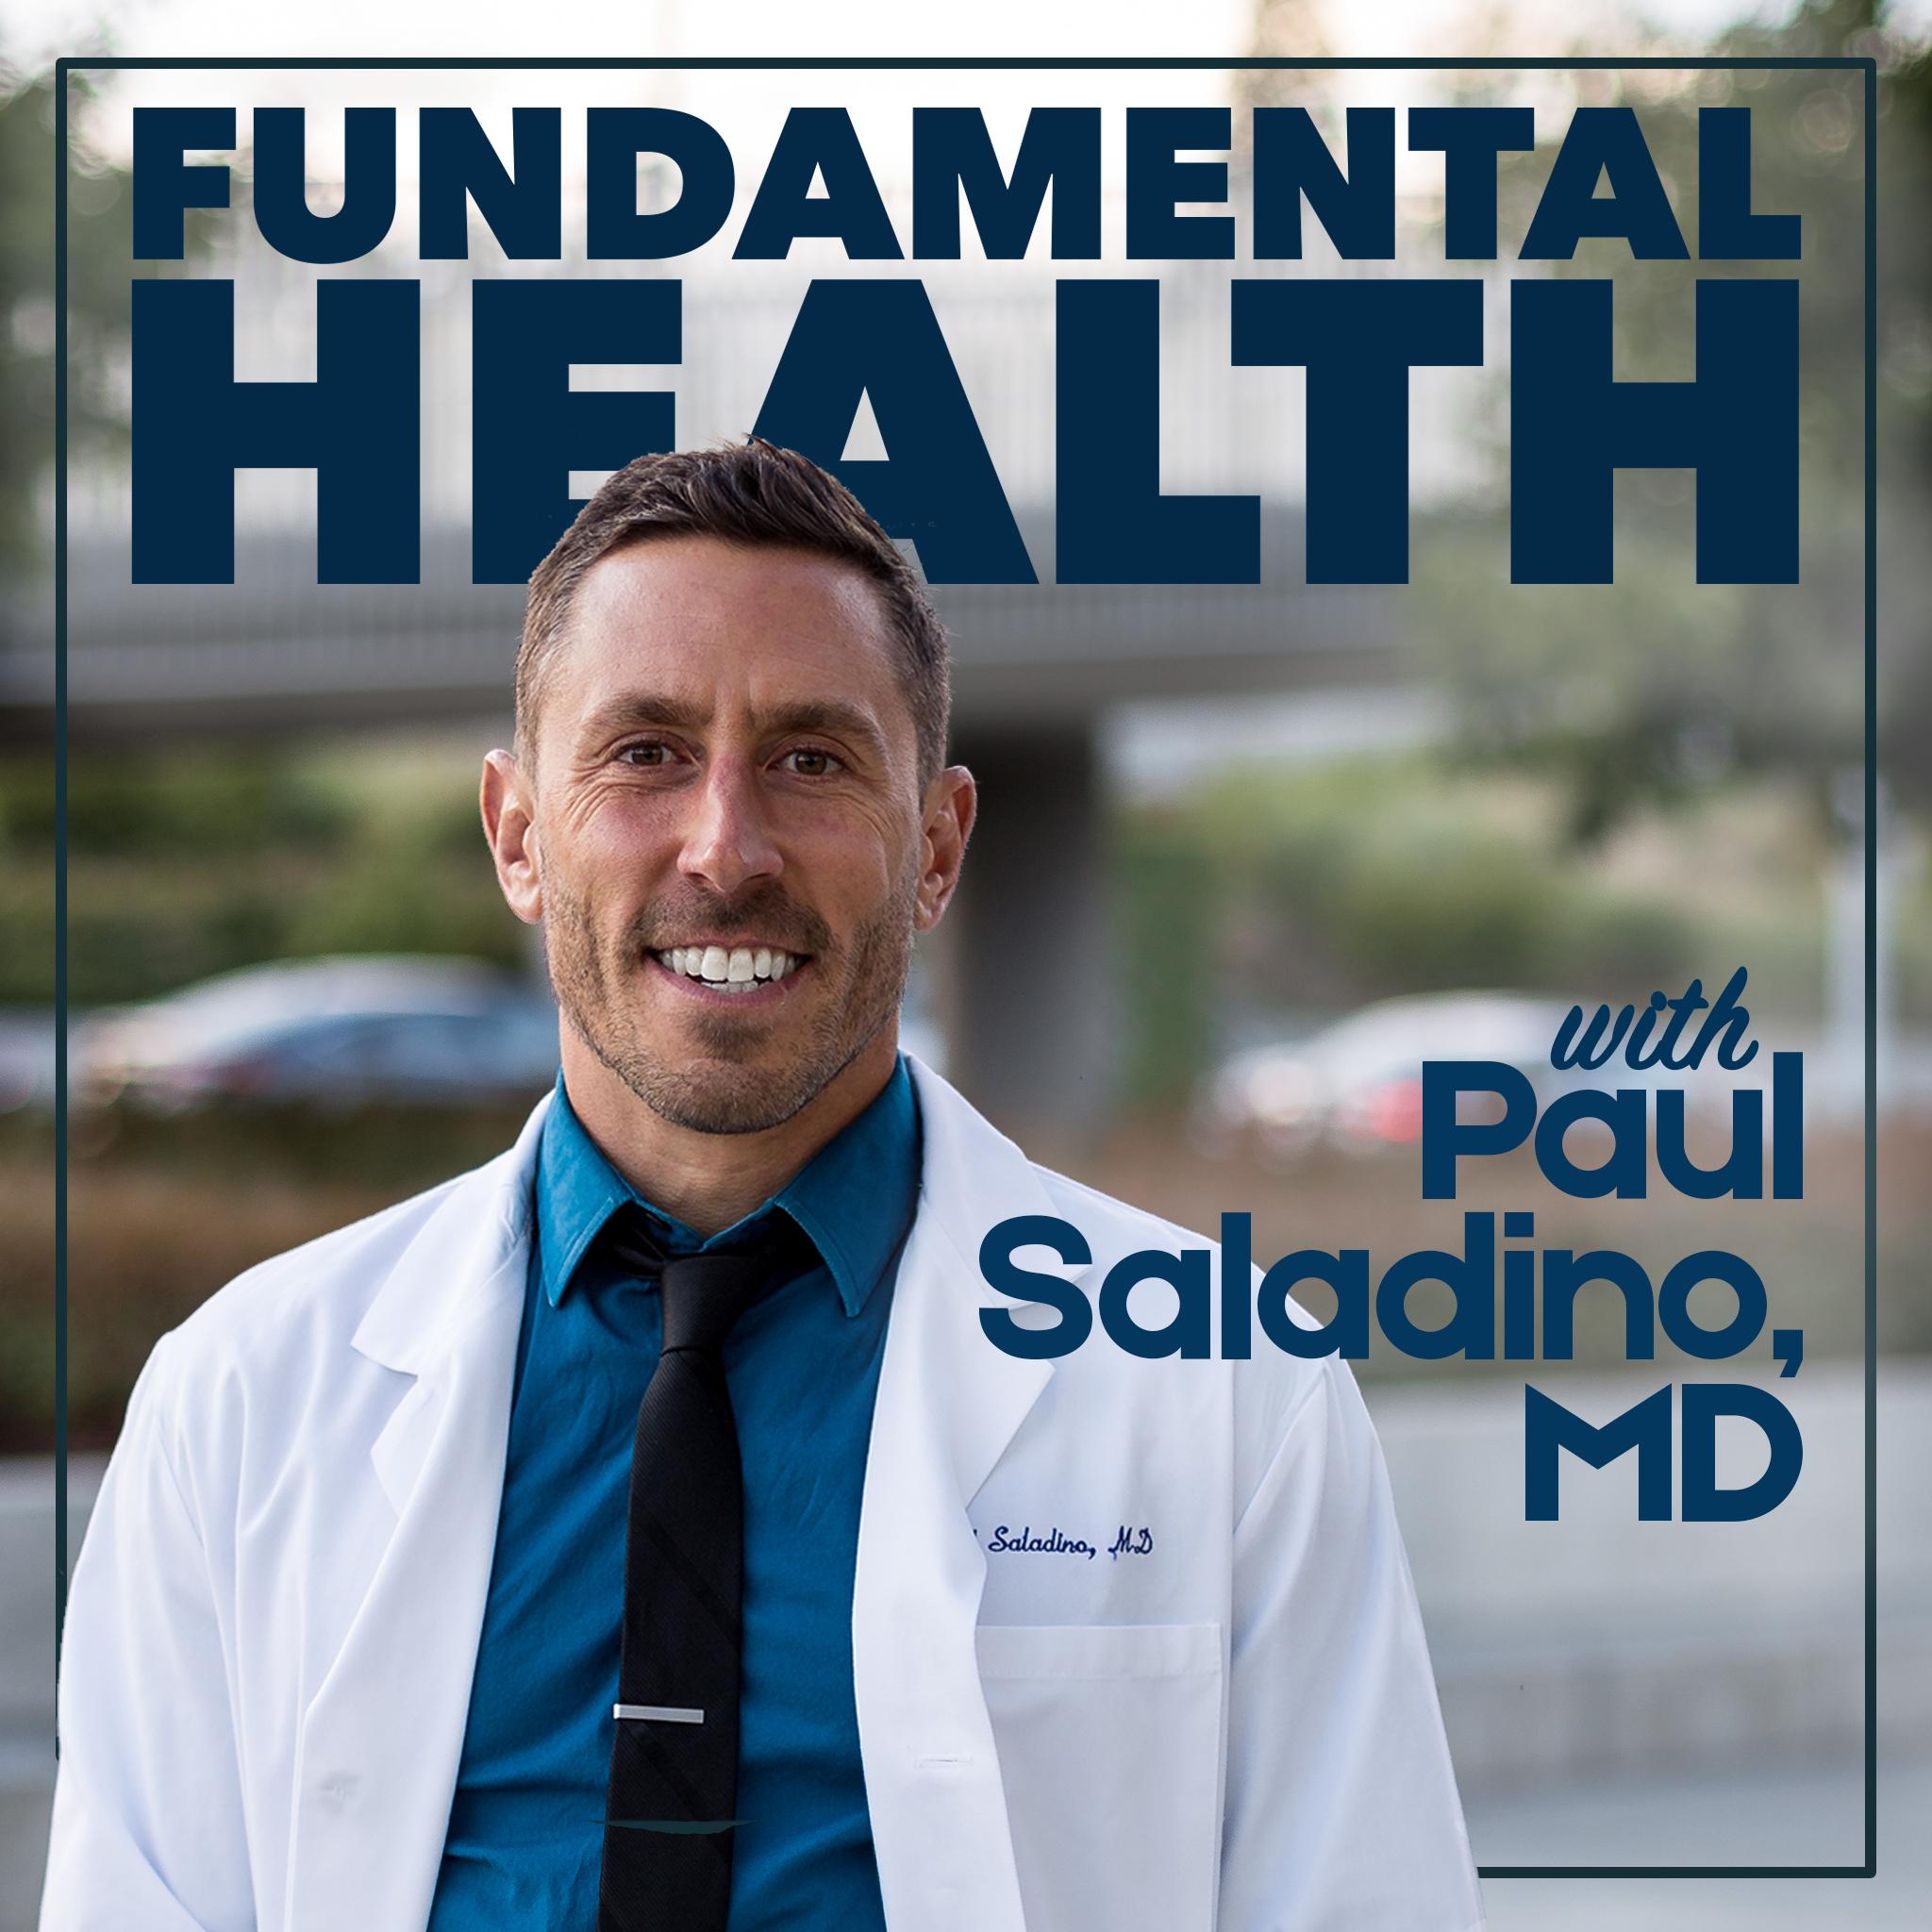 Fundamental Health with Paul Saladino, MD show art